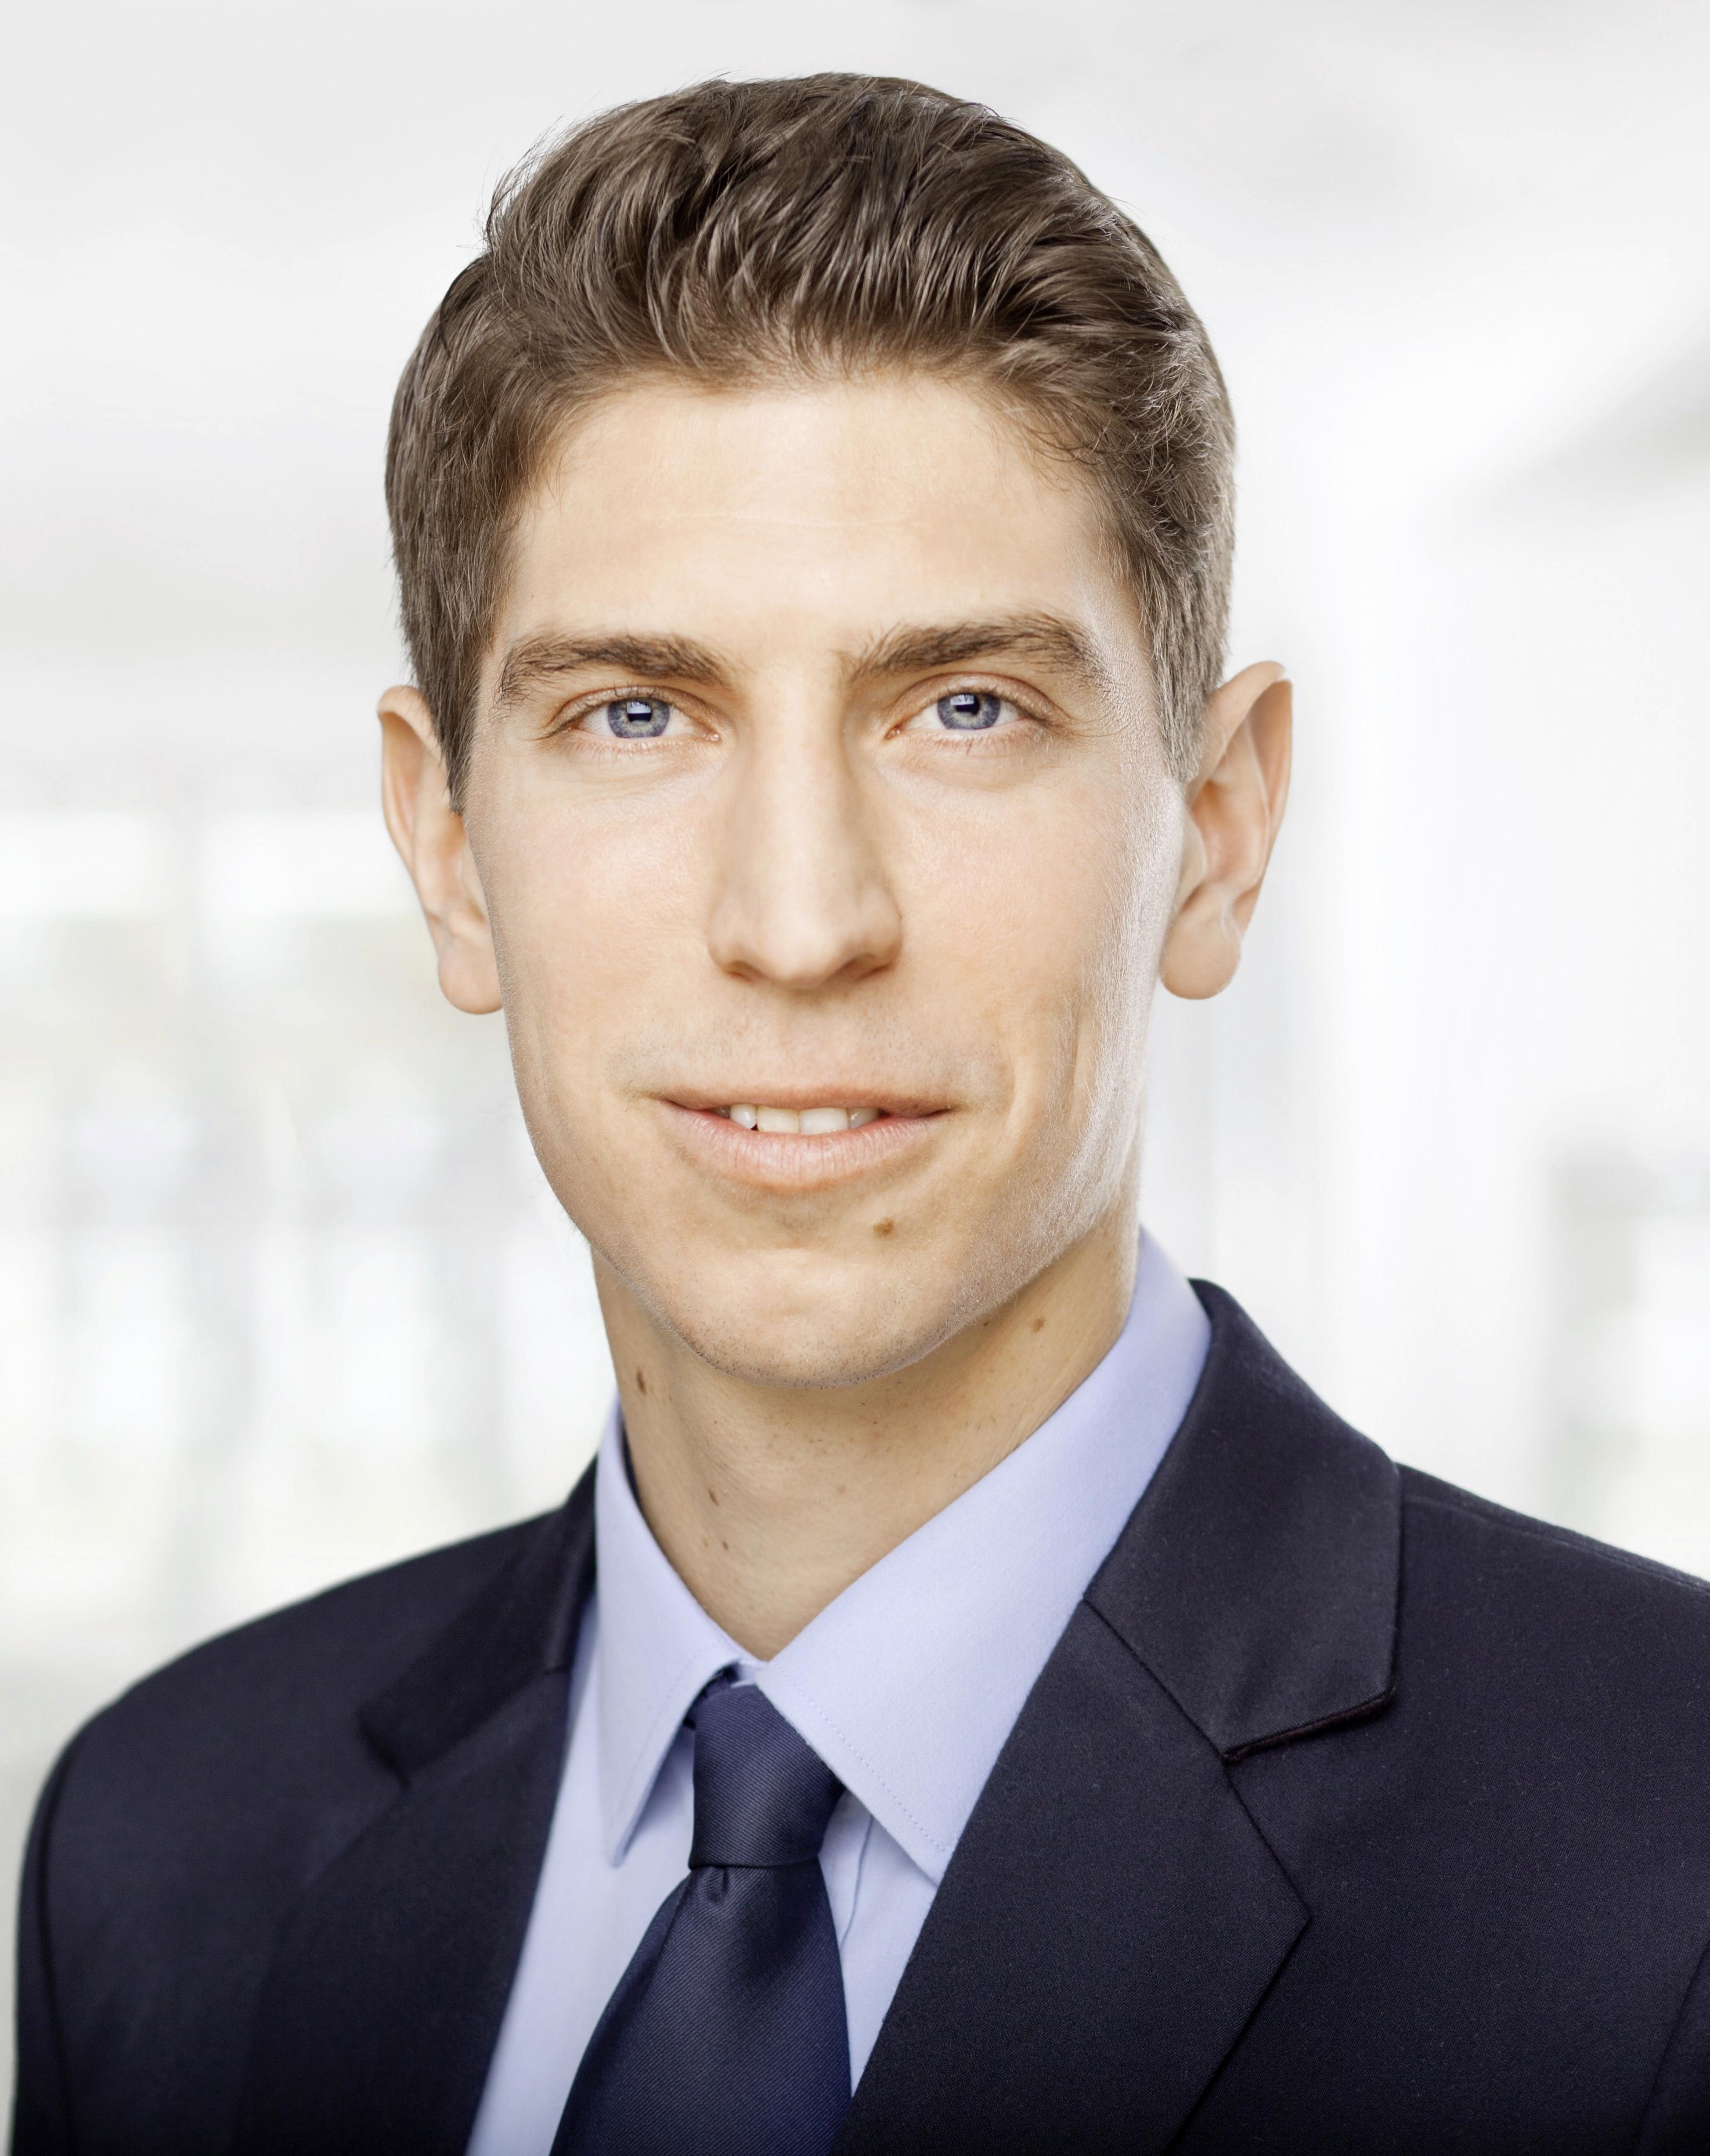 Adrian Fiedler